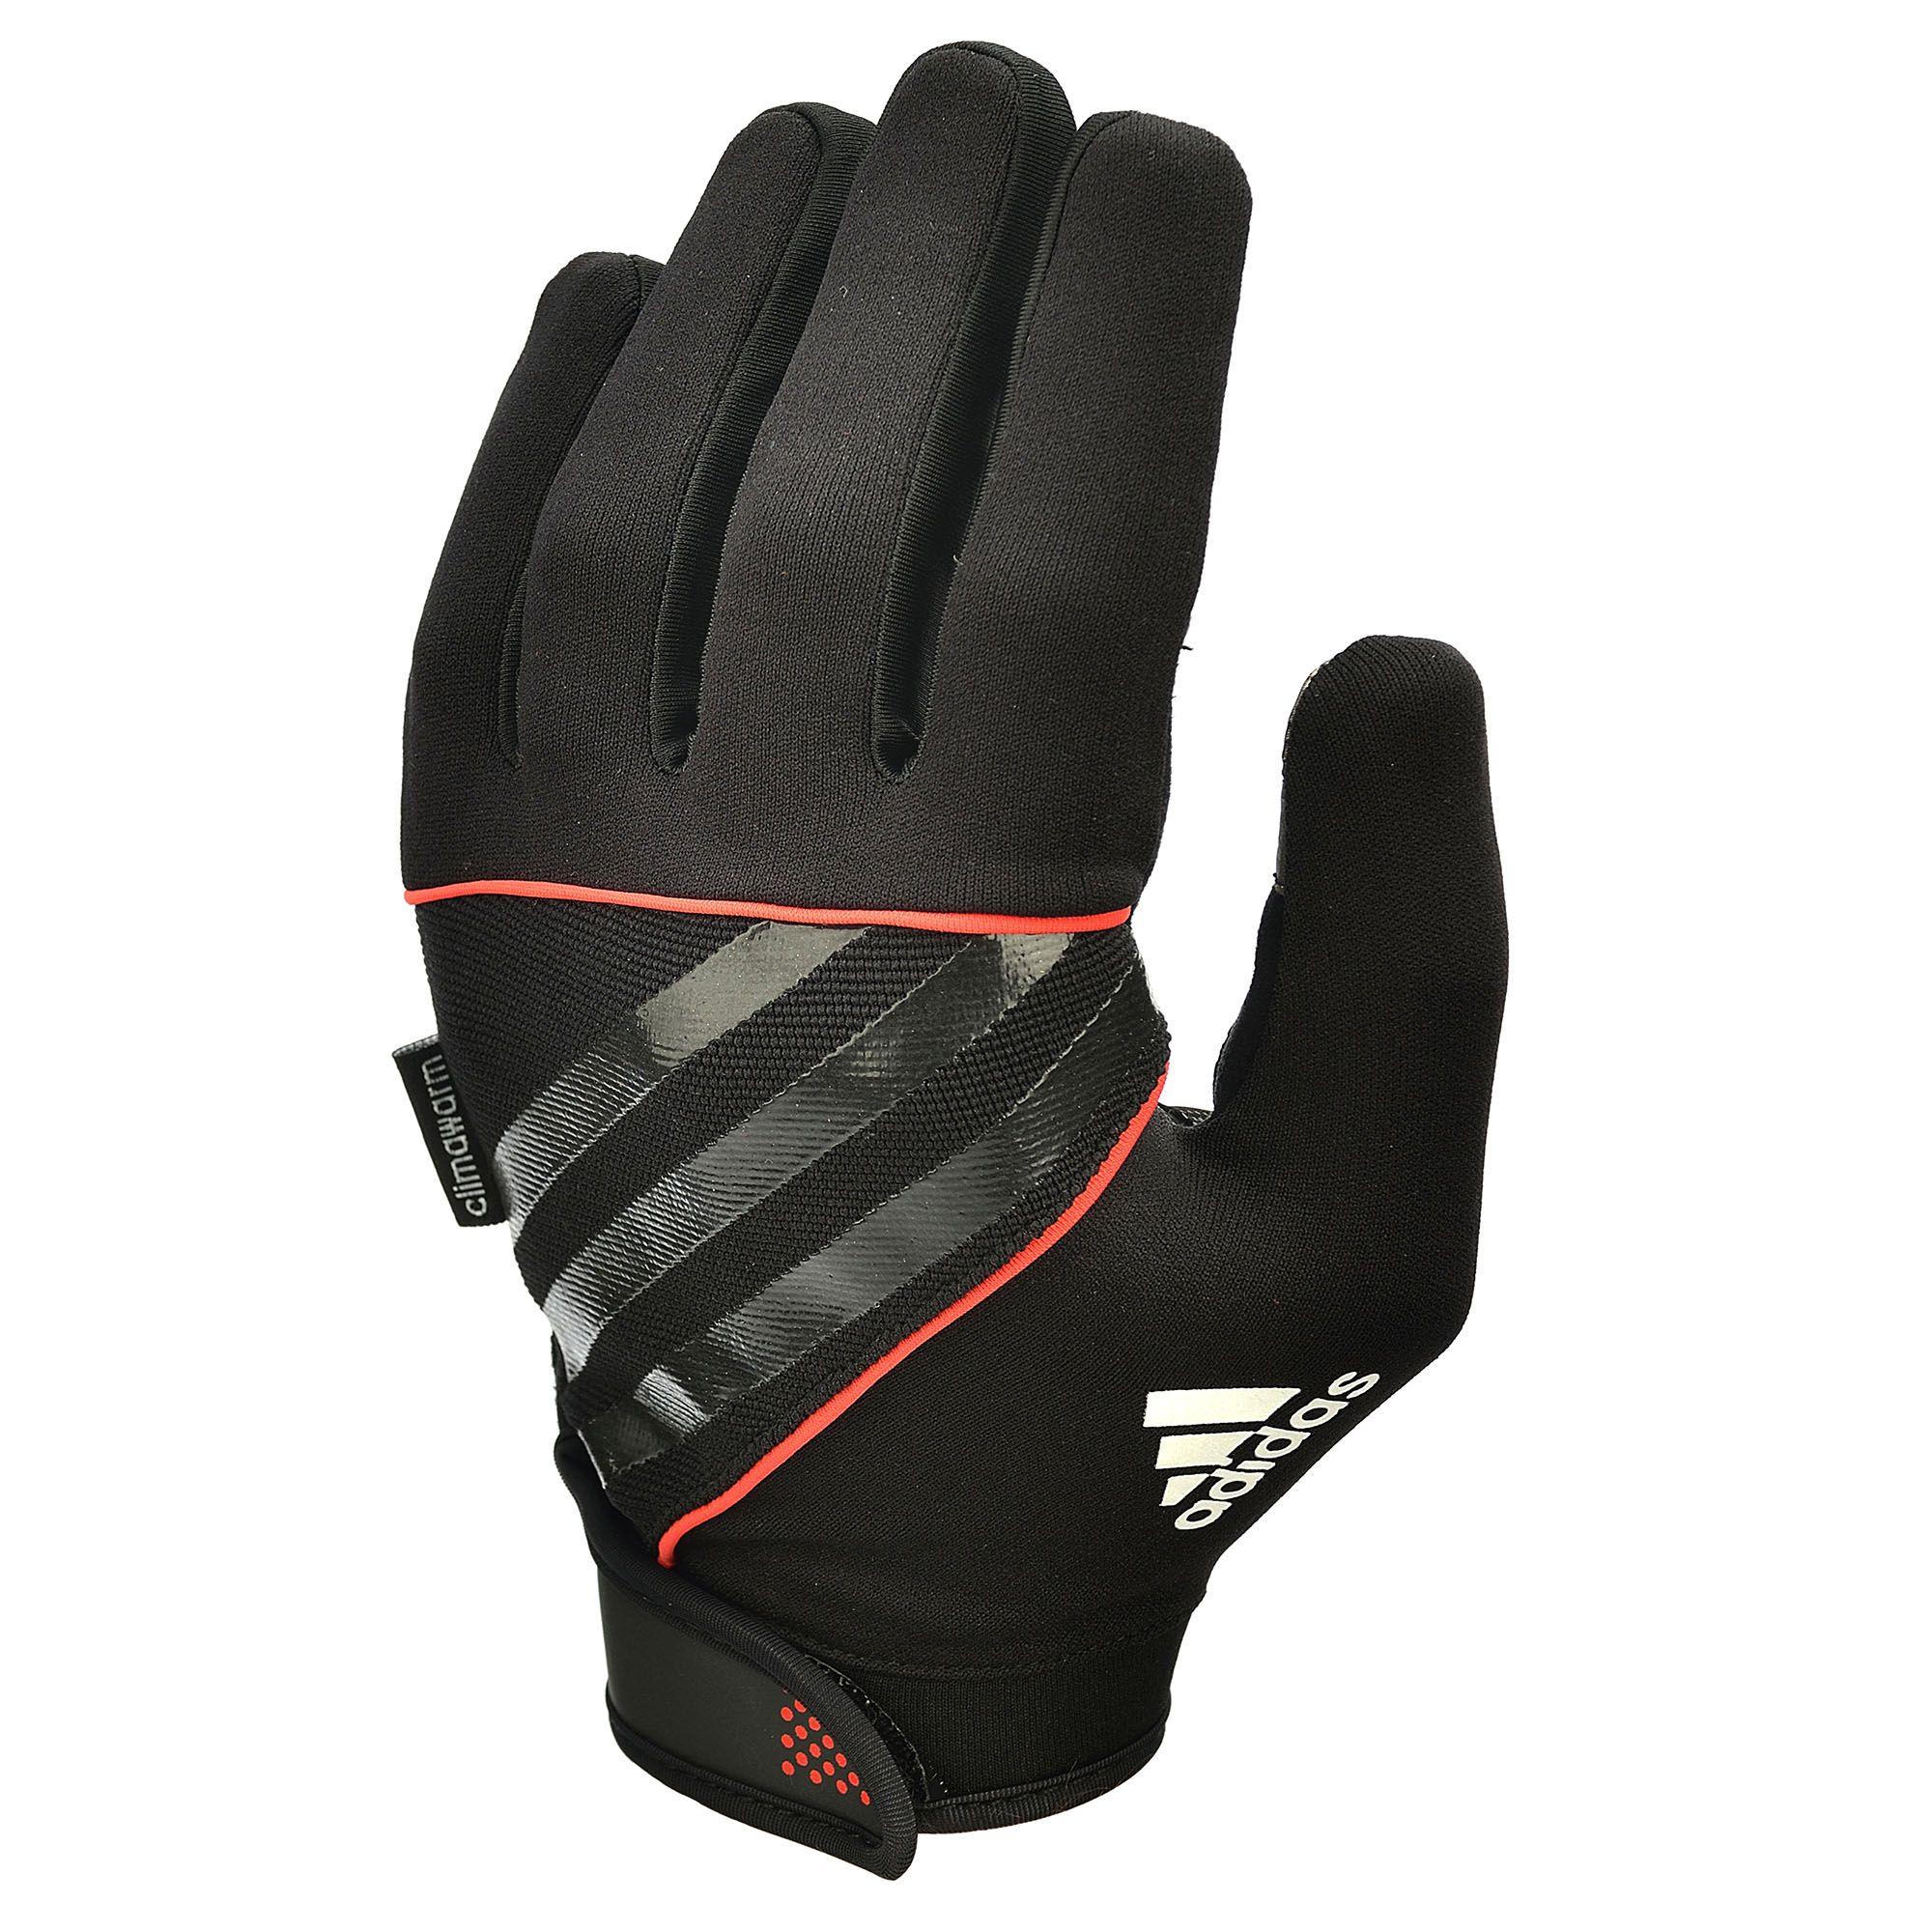 Adidas Performance Full Finger Gloves Sweatband Com